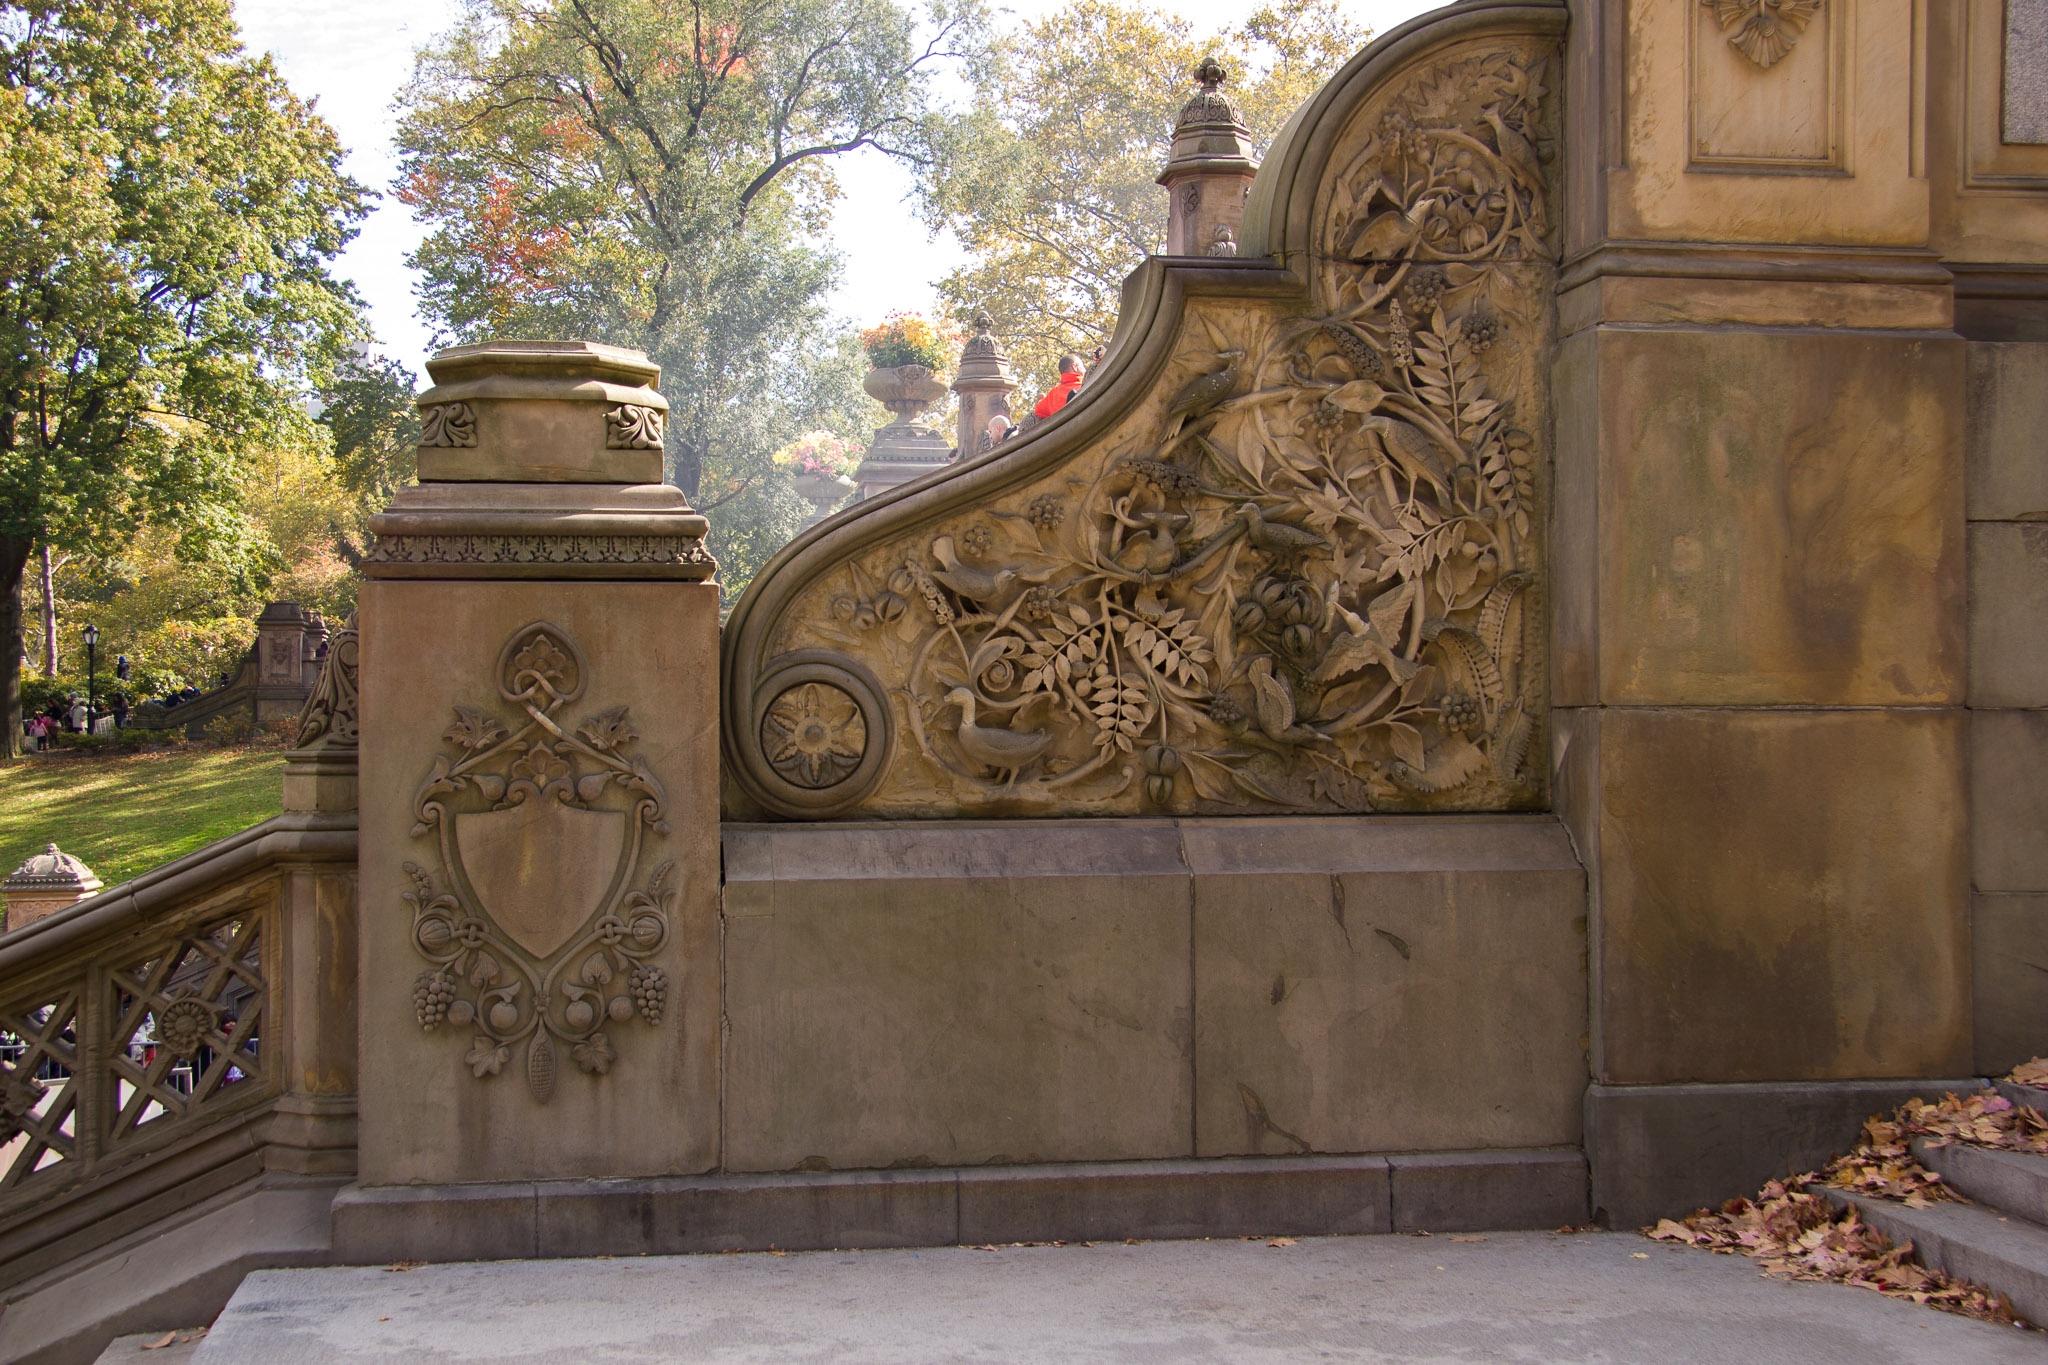 steps-to-bethesda-fountain-central-park